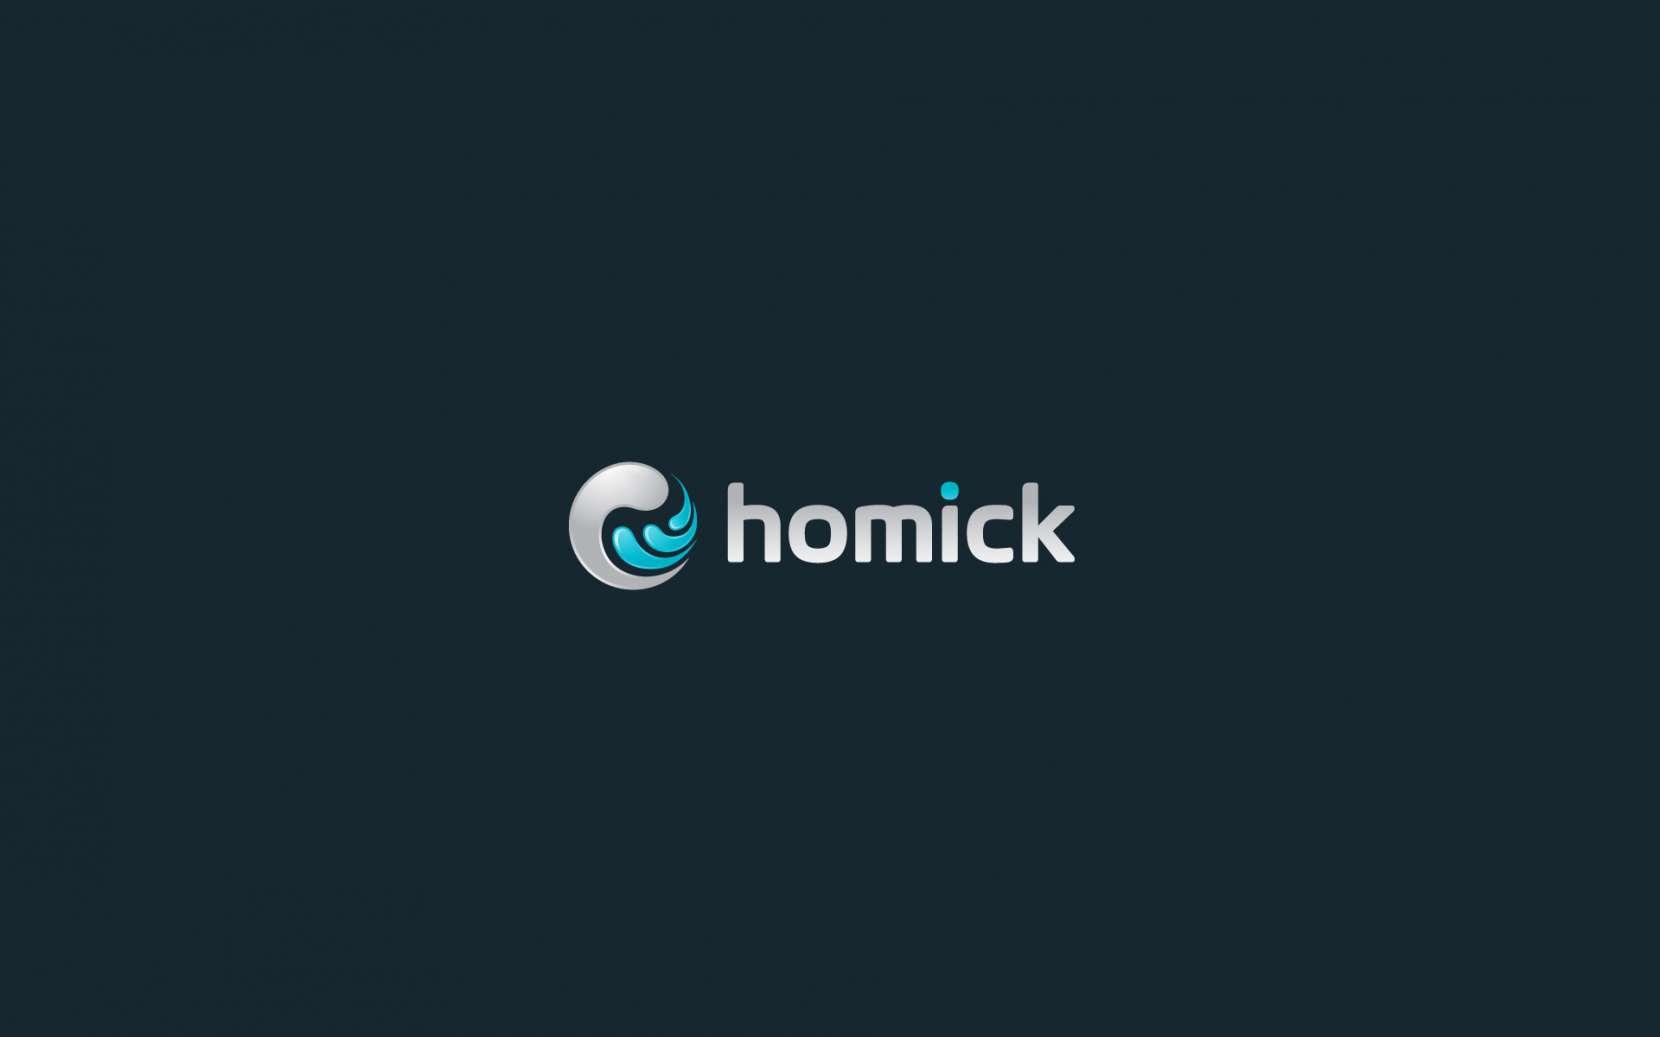 Homick.jpg